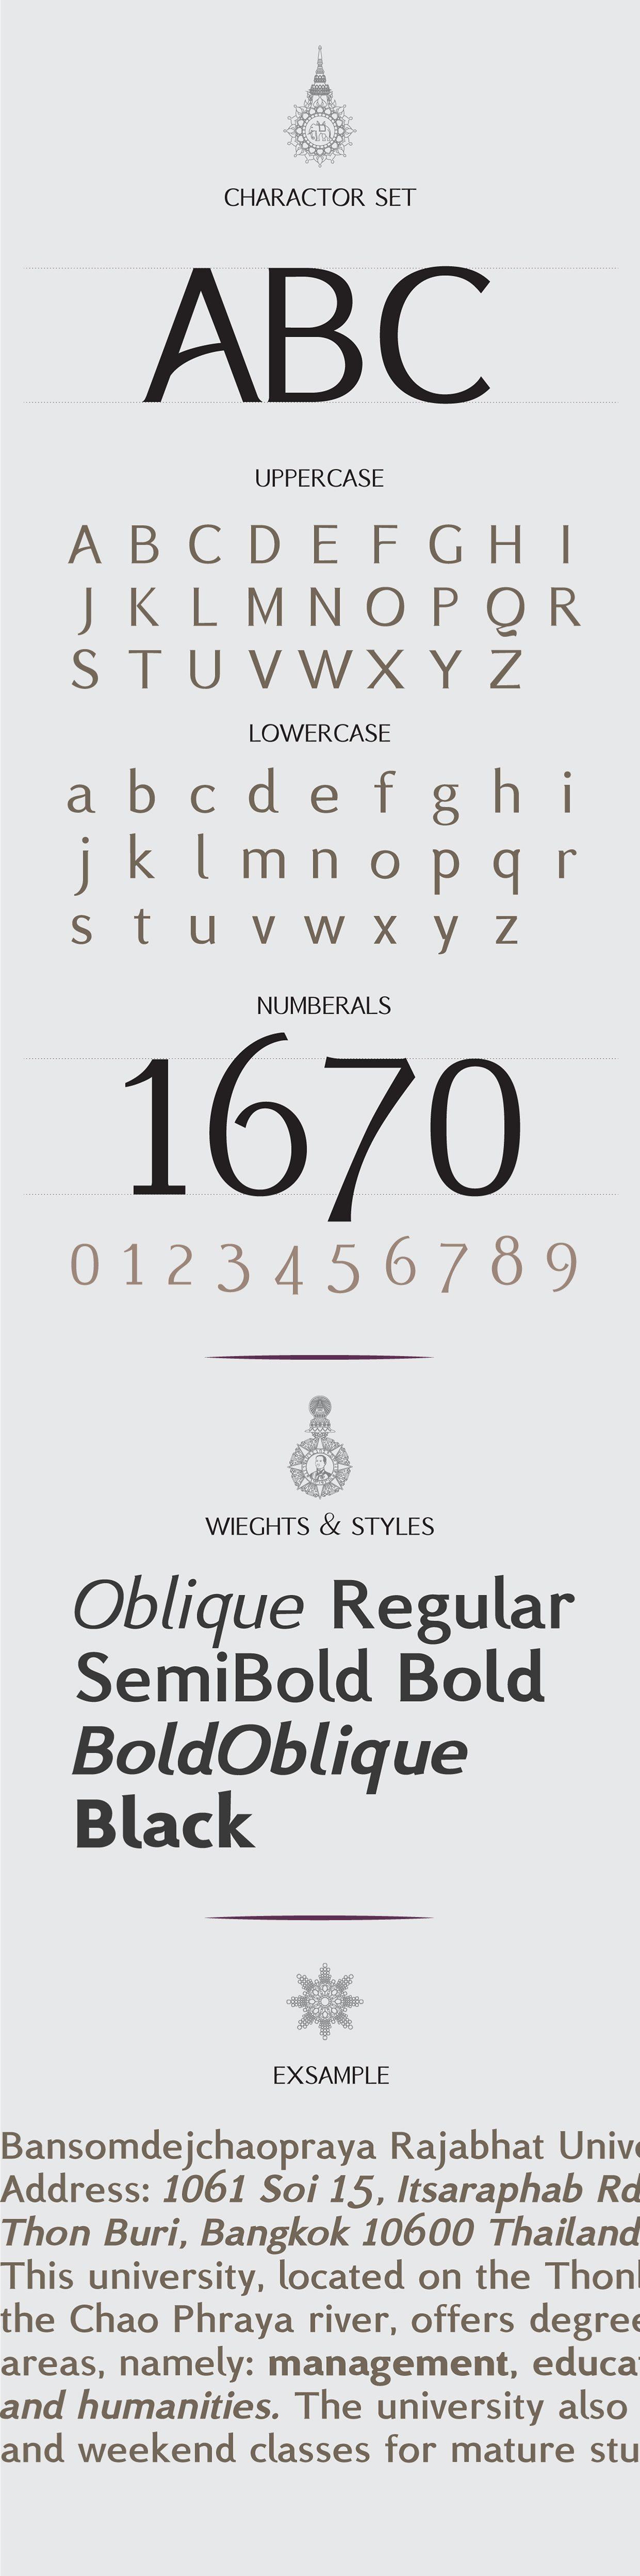 BSRU BANSOMDEJ SemiBold font